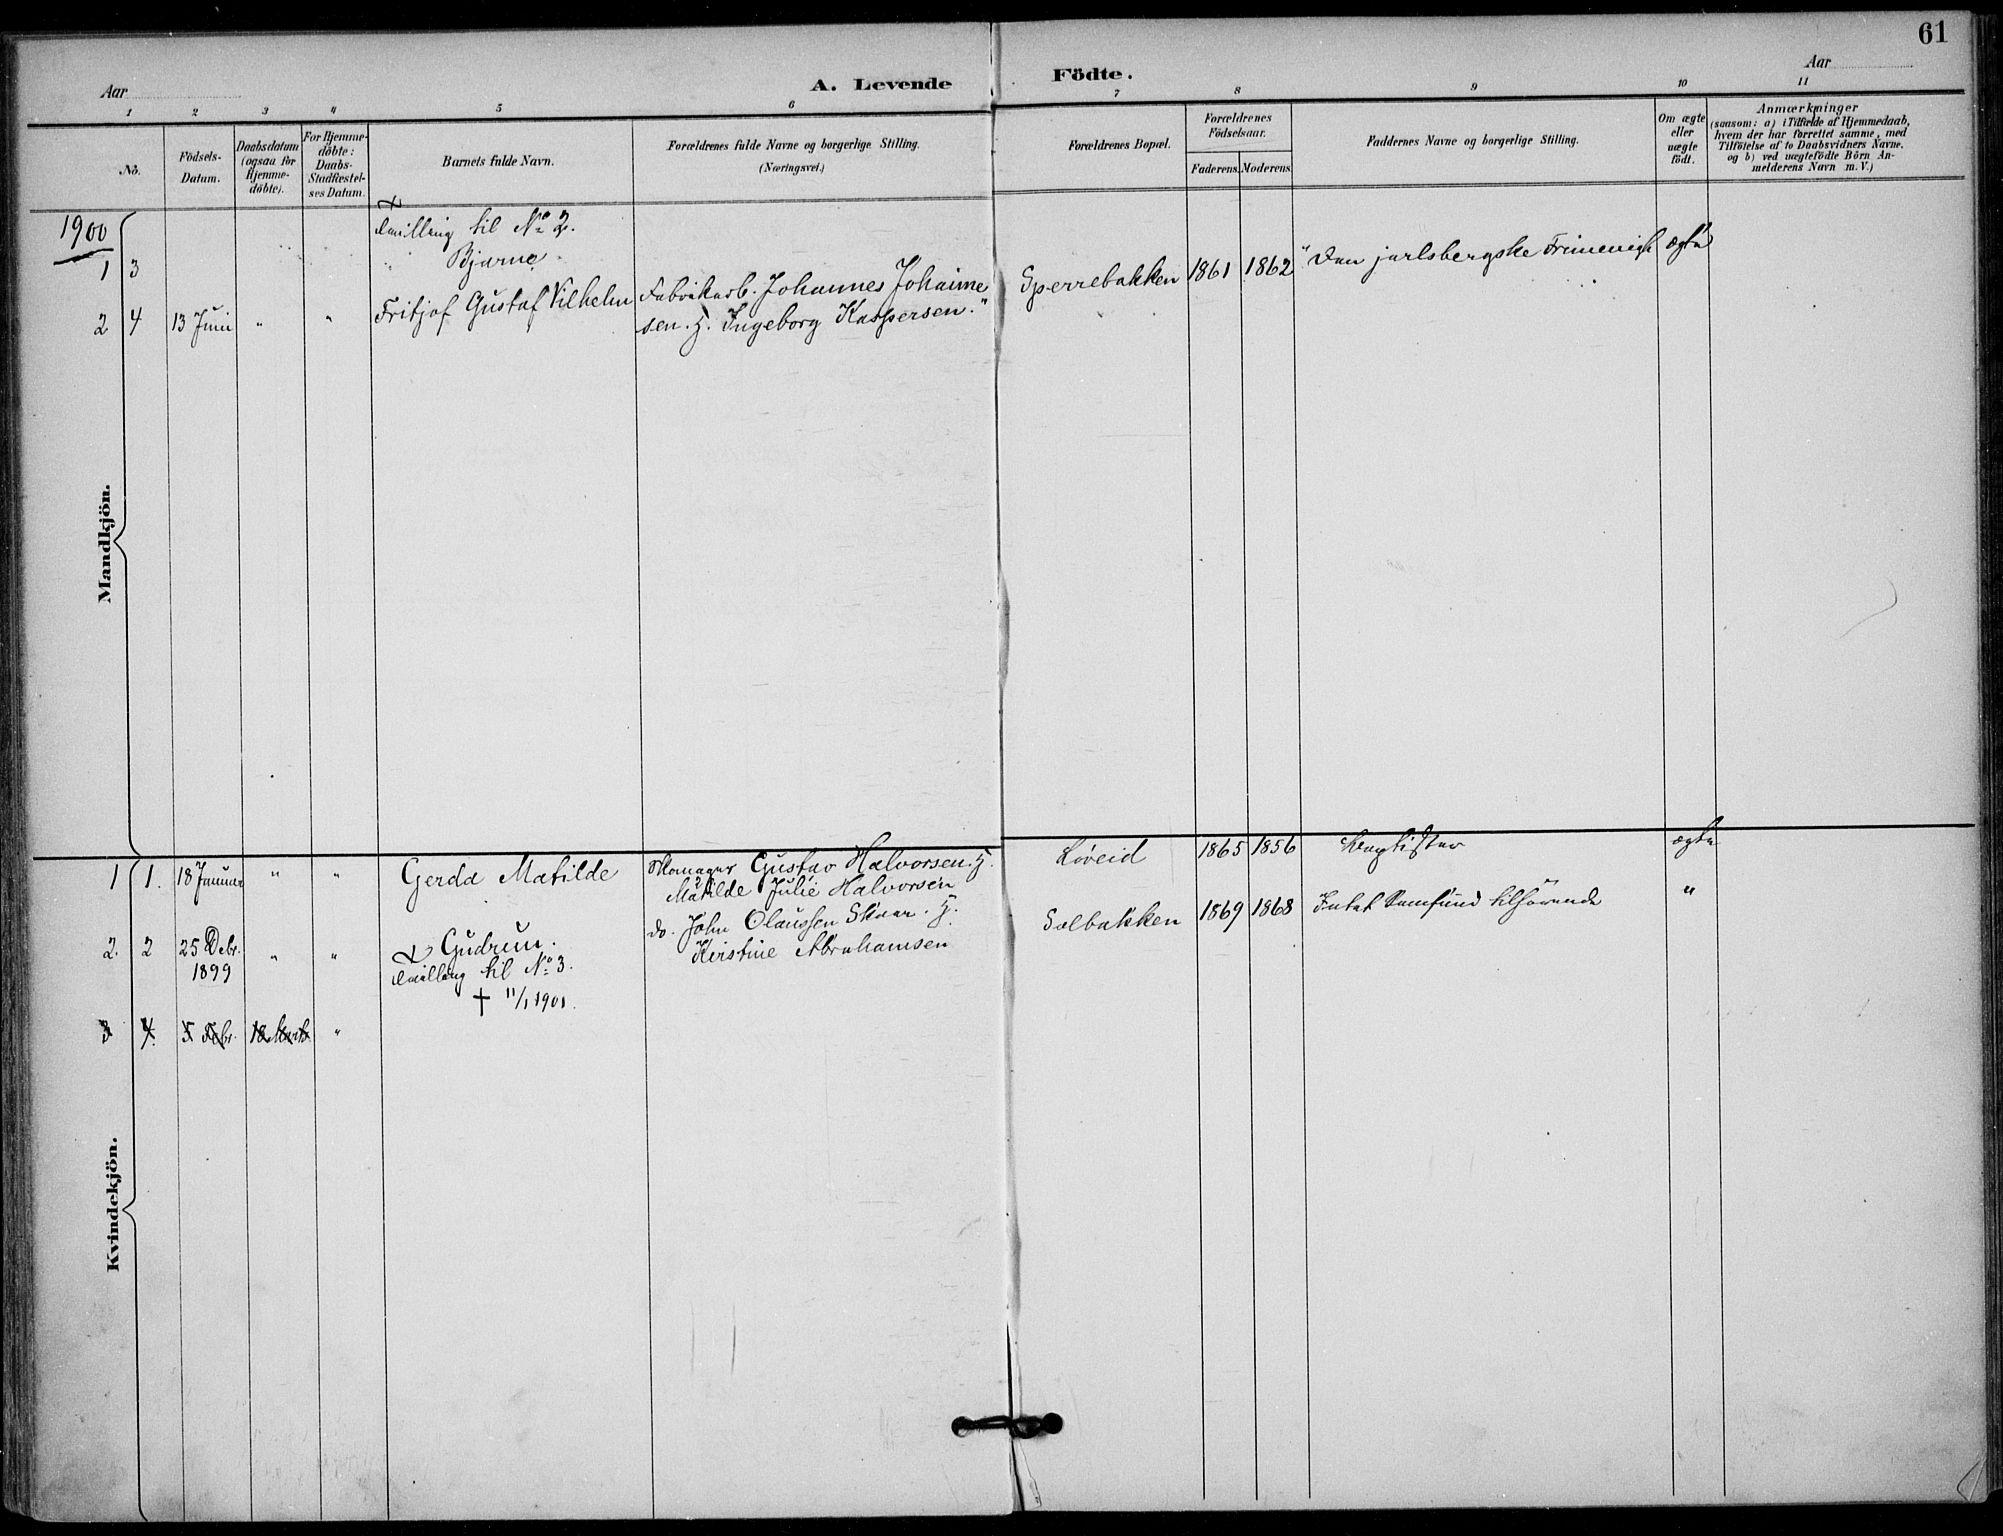 SAKO, Solum kirkebøker, F/Fb/L0002: Ministerialbok nr. II 2, 1893-1901, s. 61